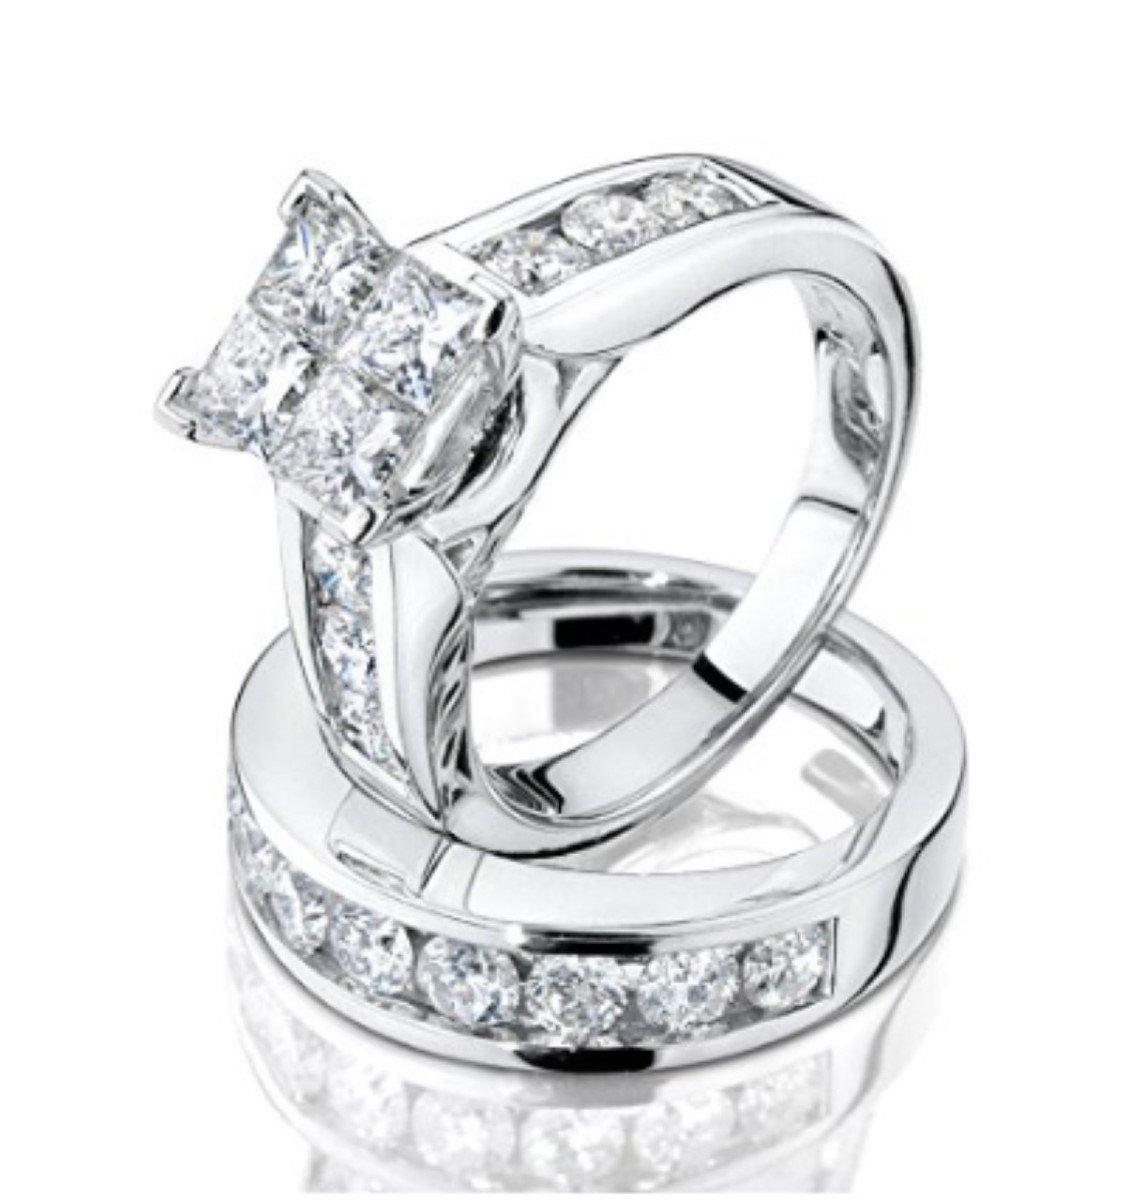 Princess Cut Diamond Engagement Ring and Wedding Band Set 1/2 Carat (ctw) in 10K White Gold (white-gold, 7)